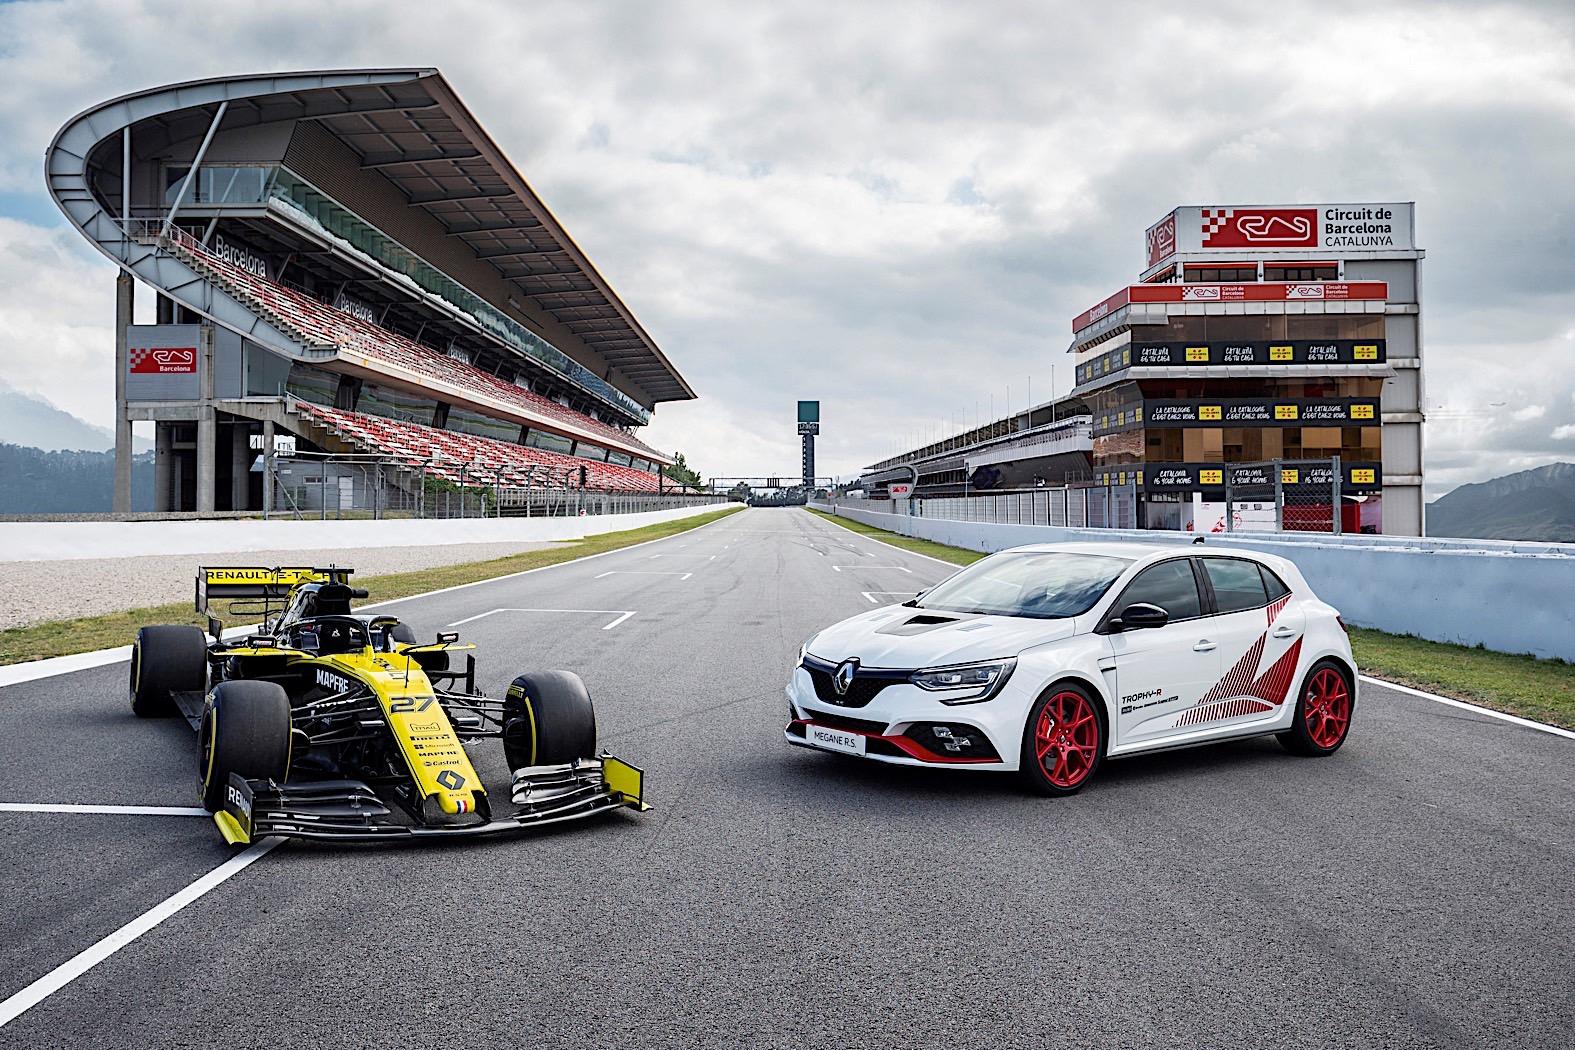 2020 Renault Megane RS Trophy-R Is a Race Car on Steroids